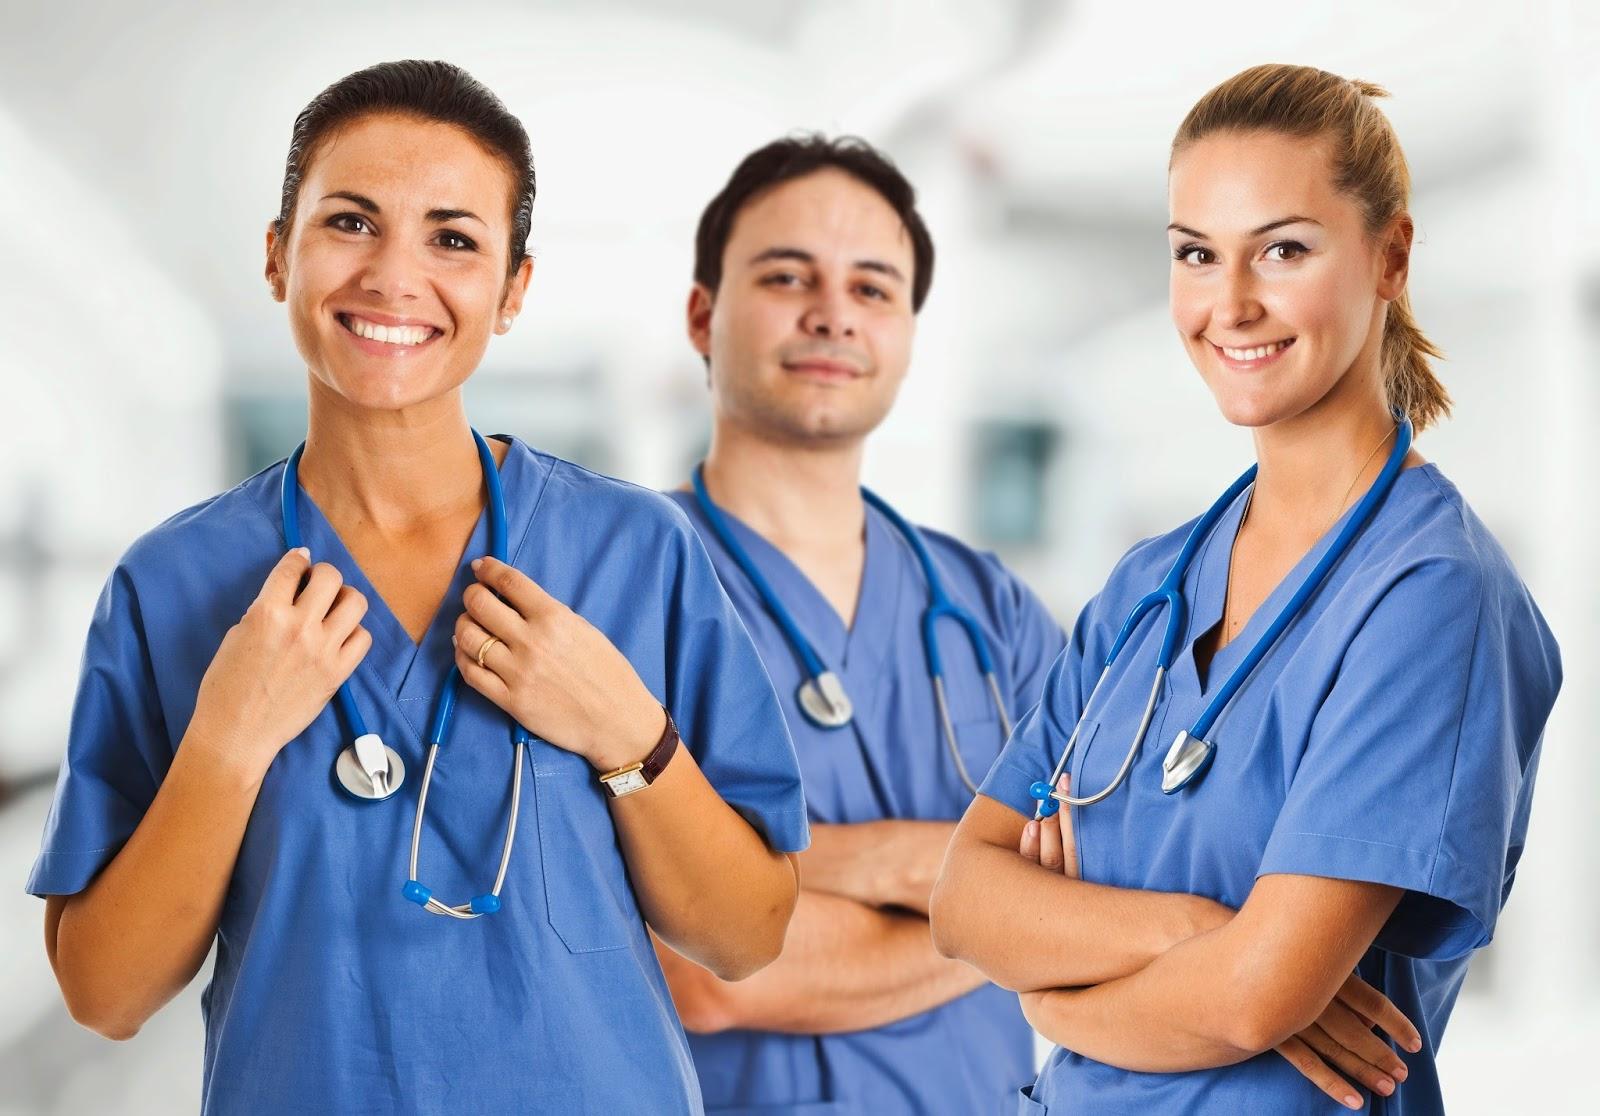 Ordine Infermieri e Professioni Sanitarie: decreto attuativo Legge Lorenzin